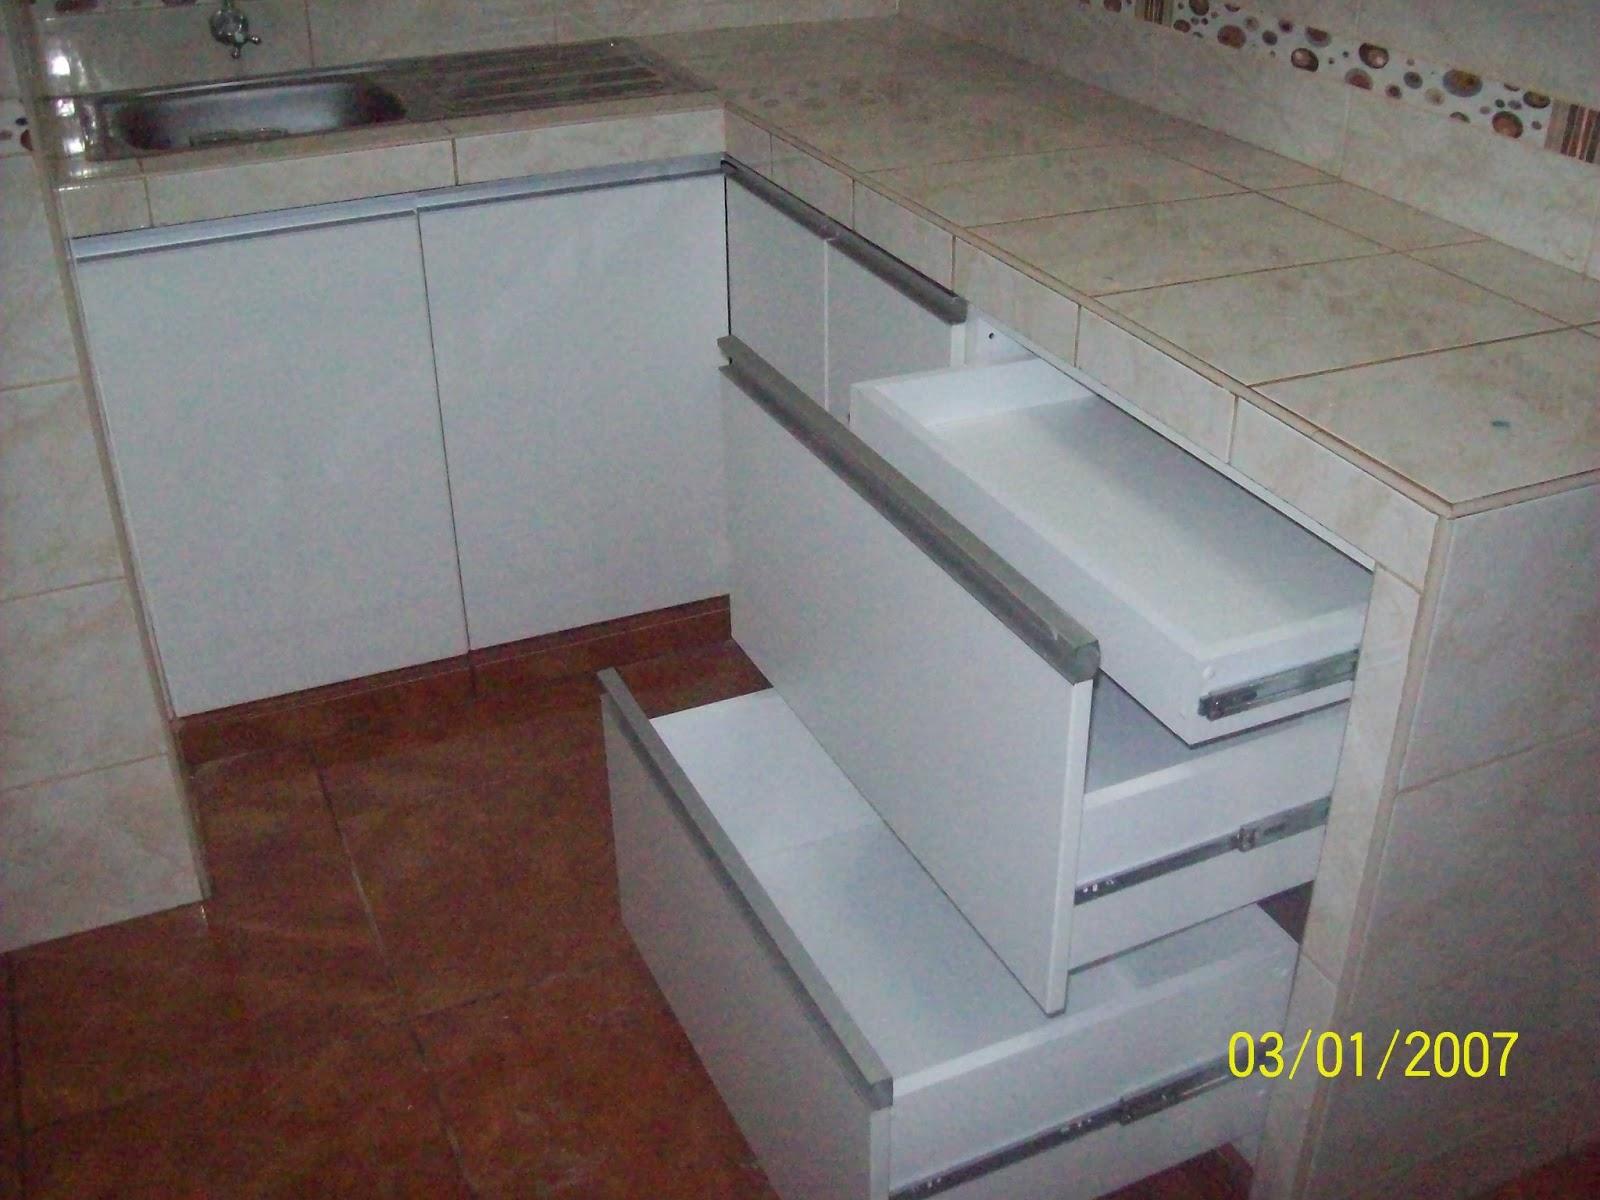 Muebles Romero El Ejido Awesome Mueble De Cocina Teka Artico  # Muebles Romero El Ejido